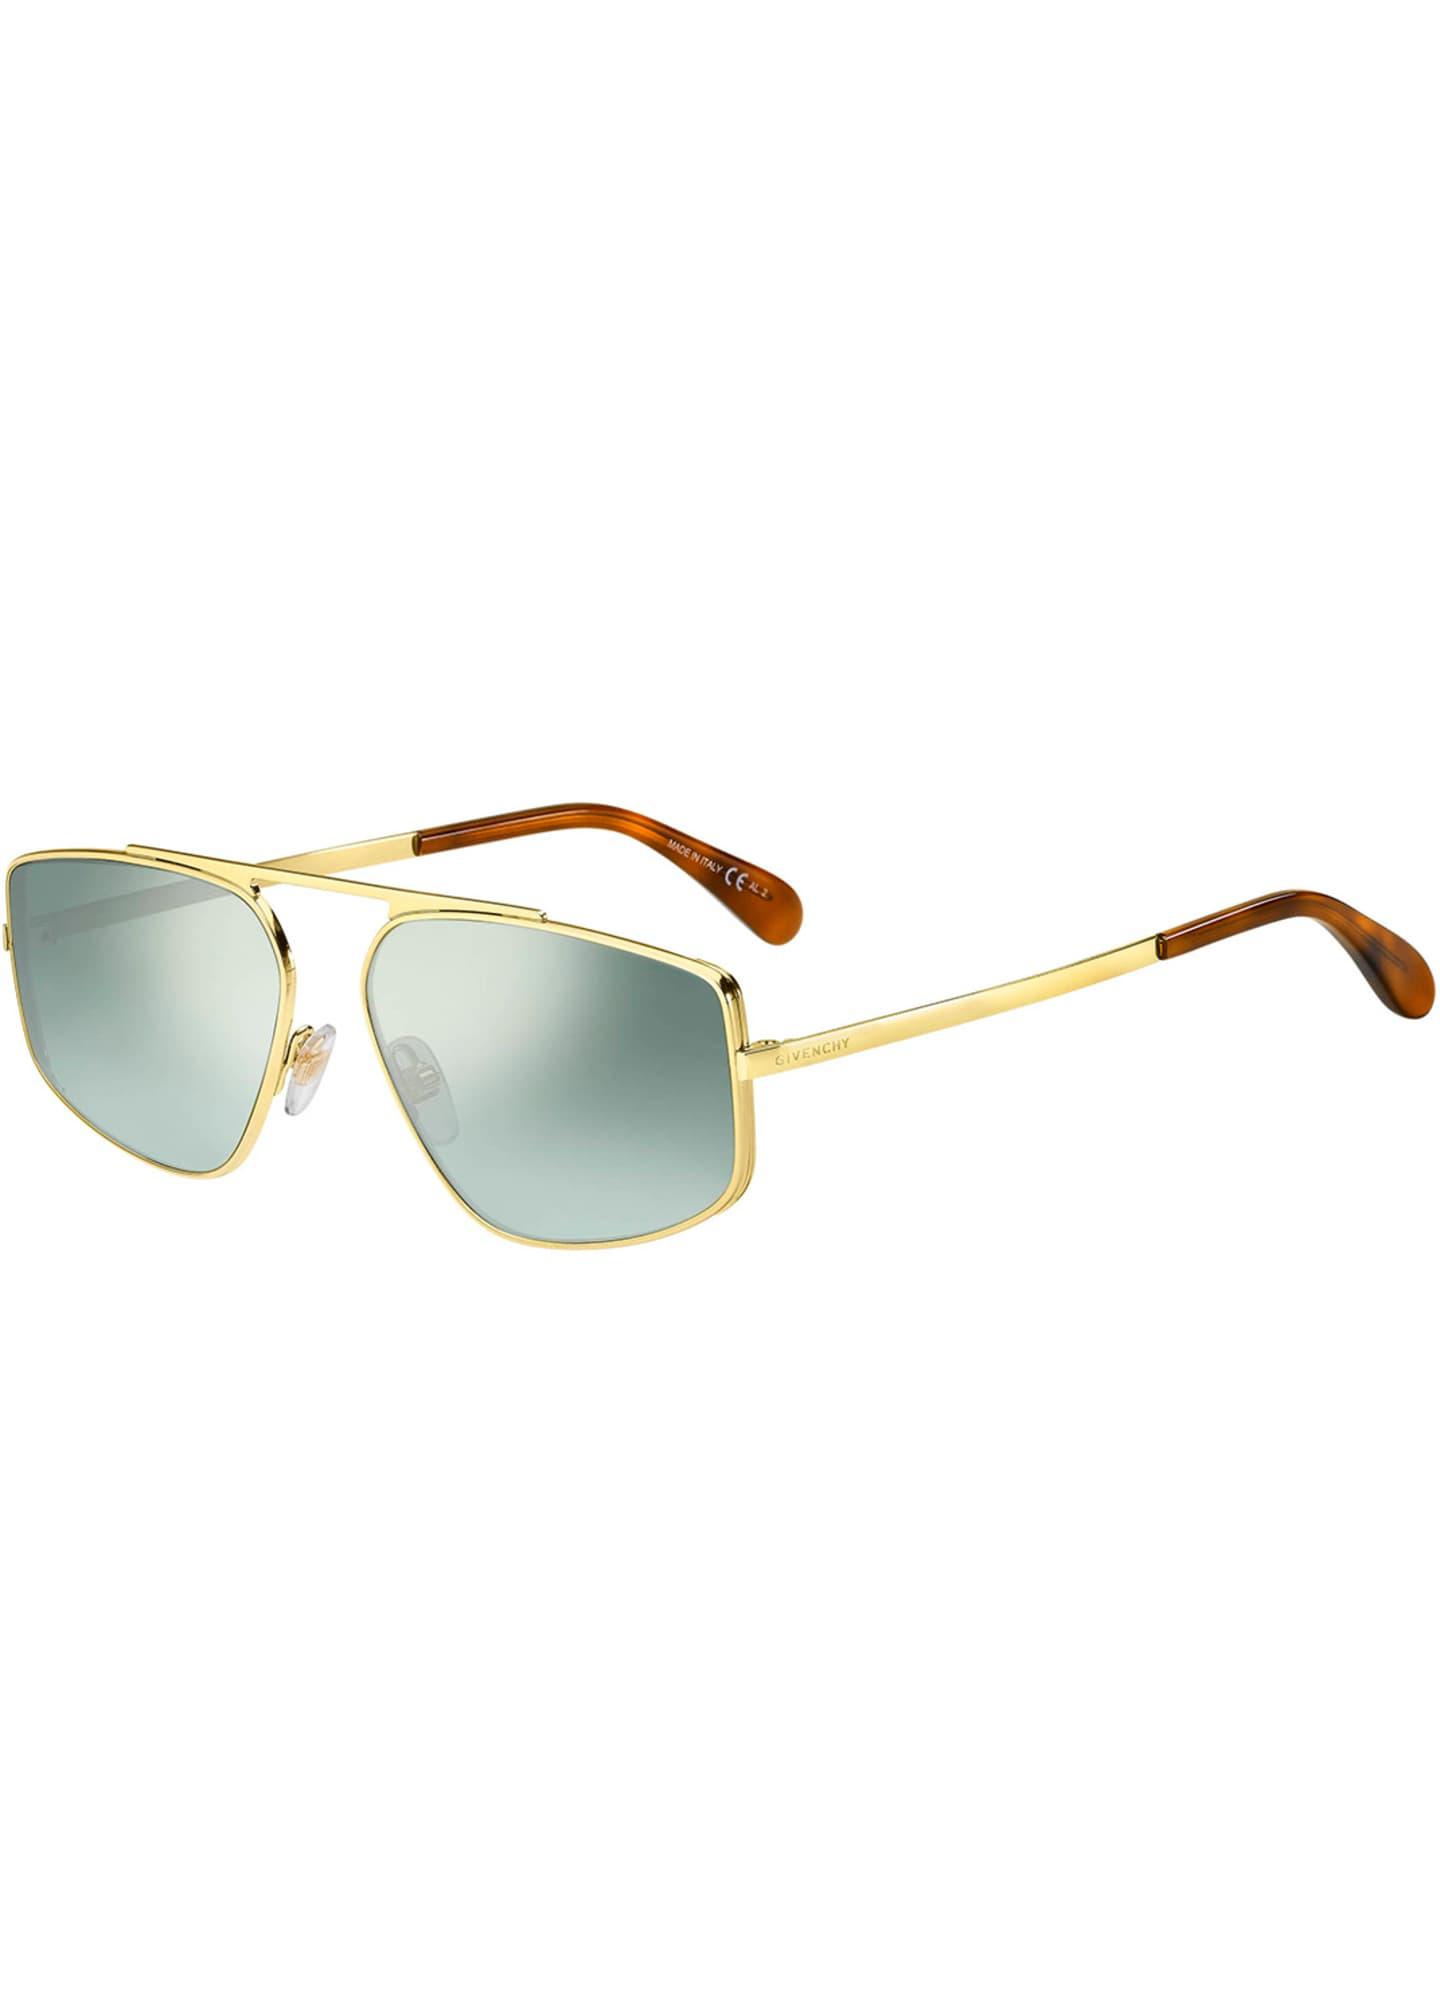 Givenchy Rectangular Mirrored-Lens Metal Sunglasses